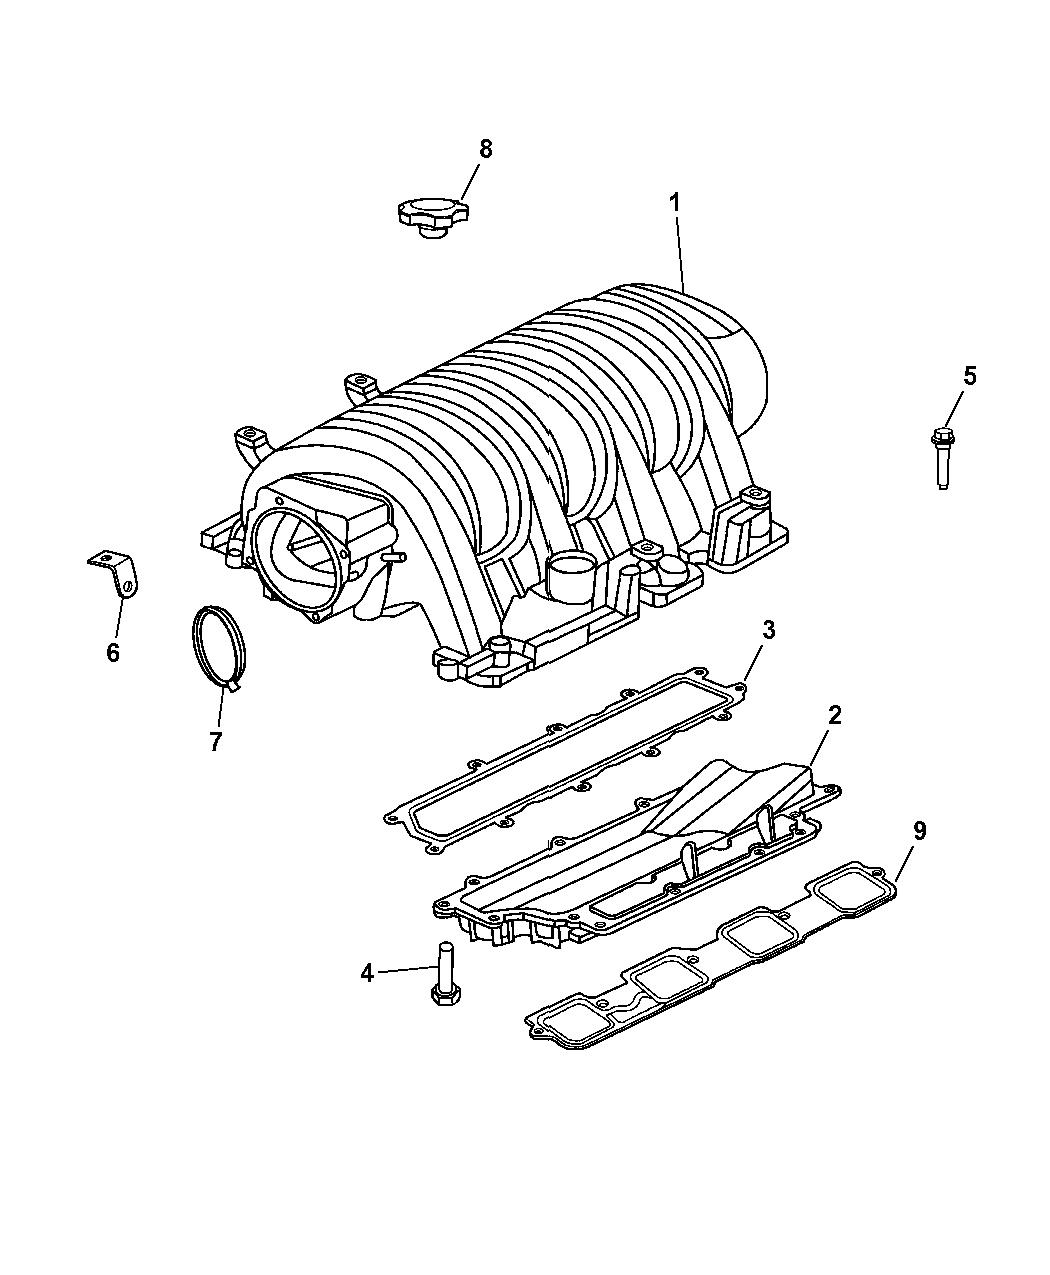 5037390ad Genuine Mopar Manifold Intake Wiring Diagram Chrysler 300 Srt8 For Part No